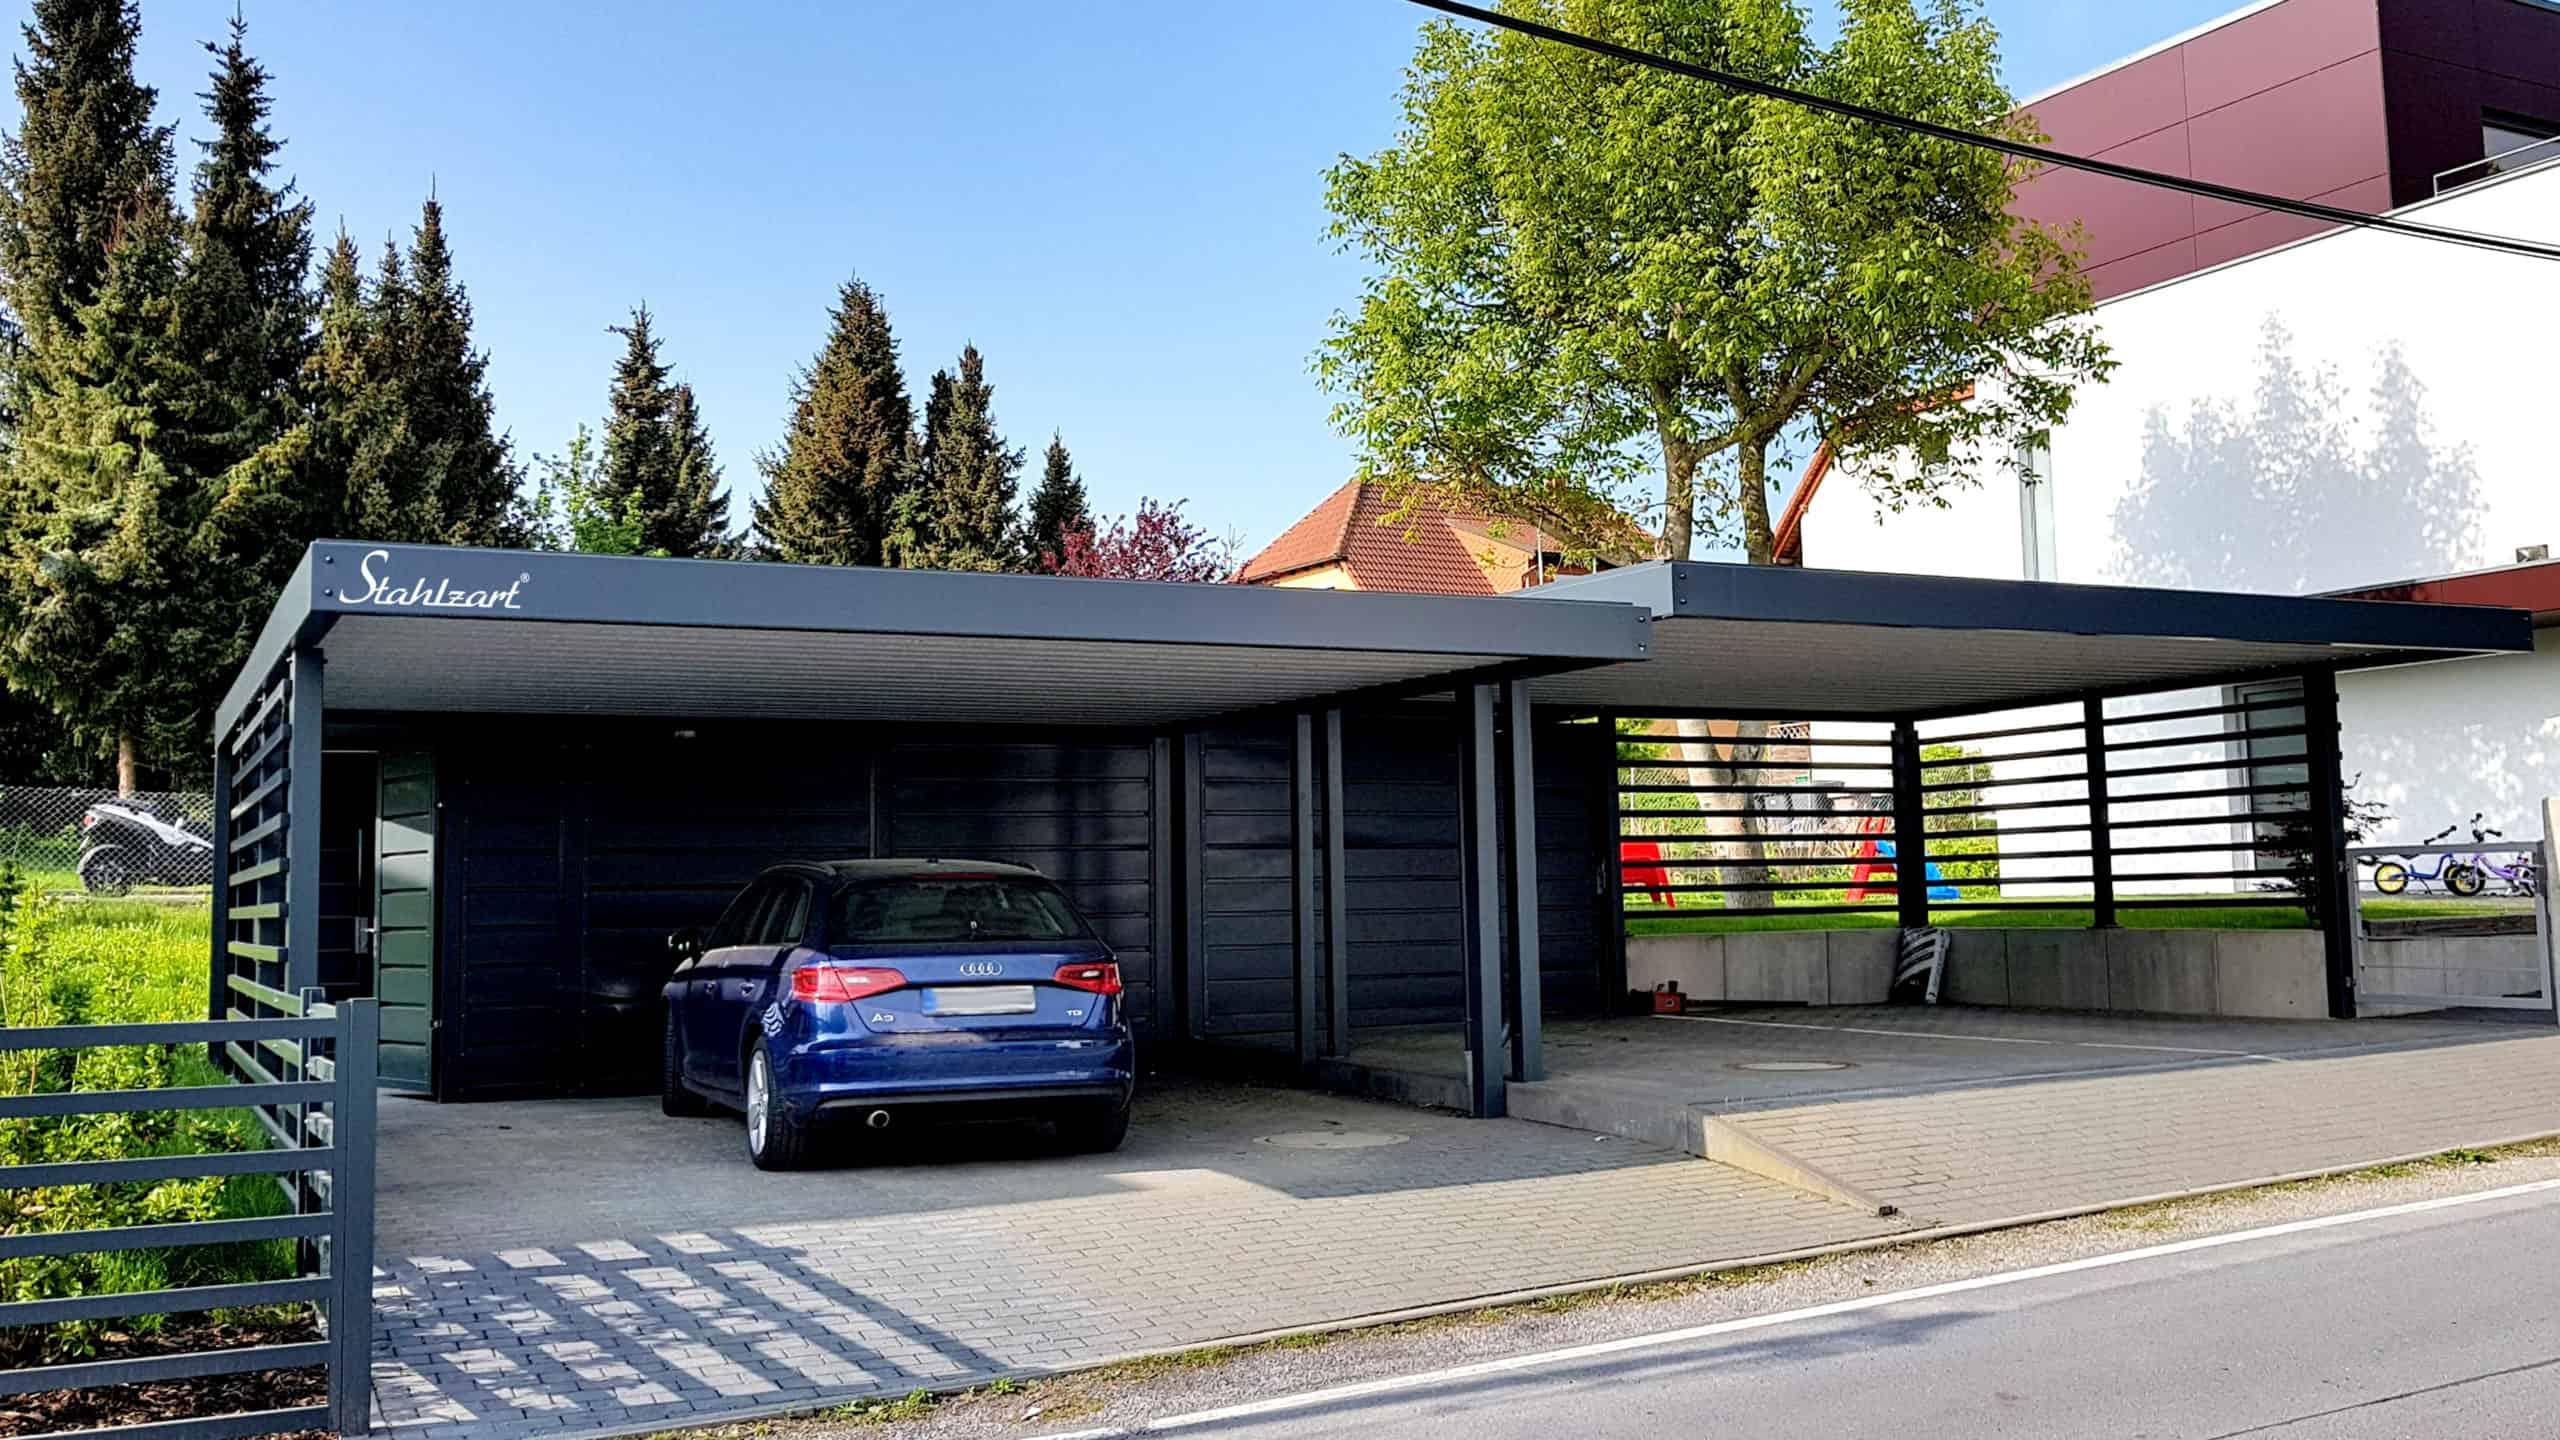 design-carport-metall-stahl-doppelcarport-anthrazit-stahlcarport-metallcarport-mit-sichtschutz-zaun-abstellraum-geraeteraum-architektur